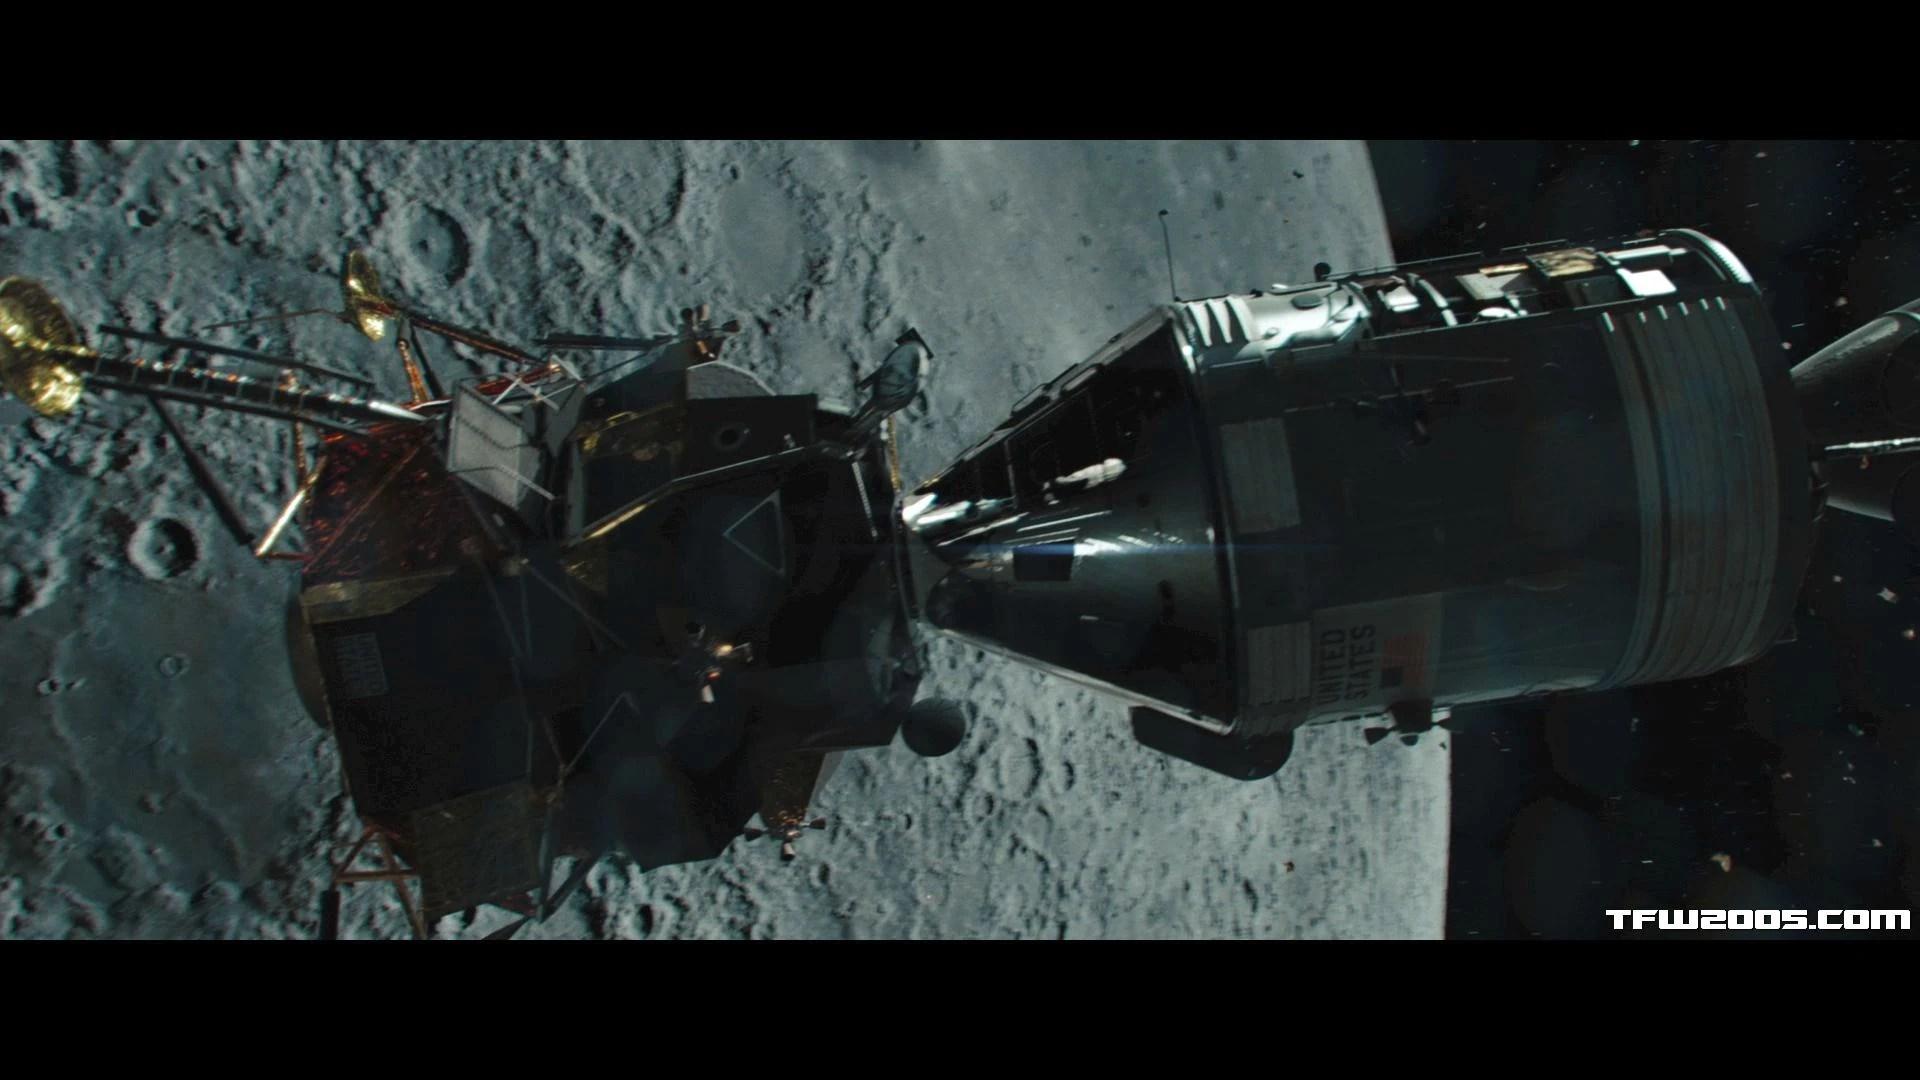 Fall Of Cybertron Wallpaper Apollo 11 Teletraan I The Transformers Wiki Fandom